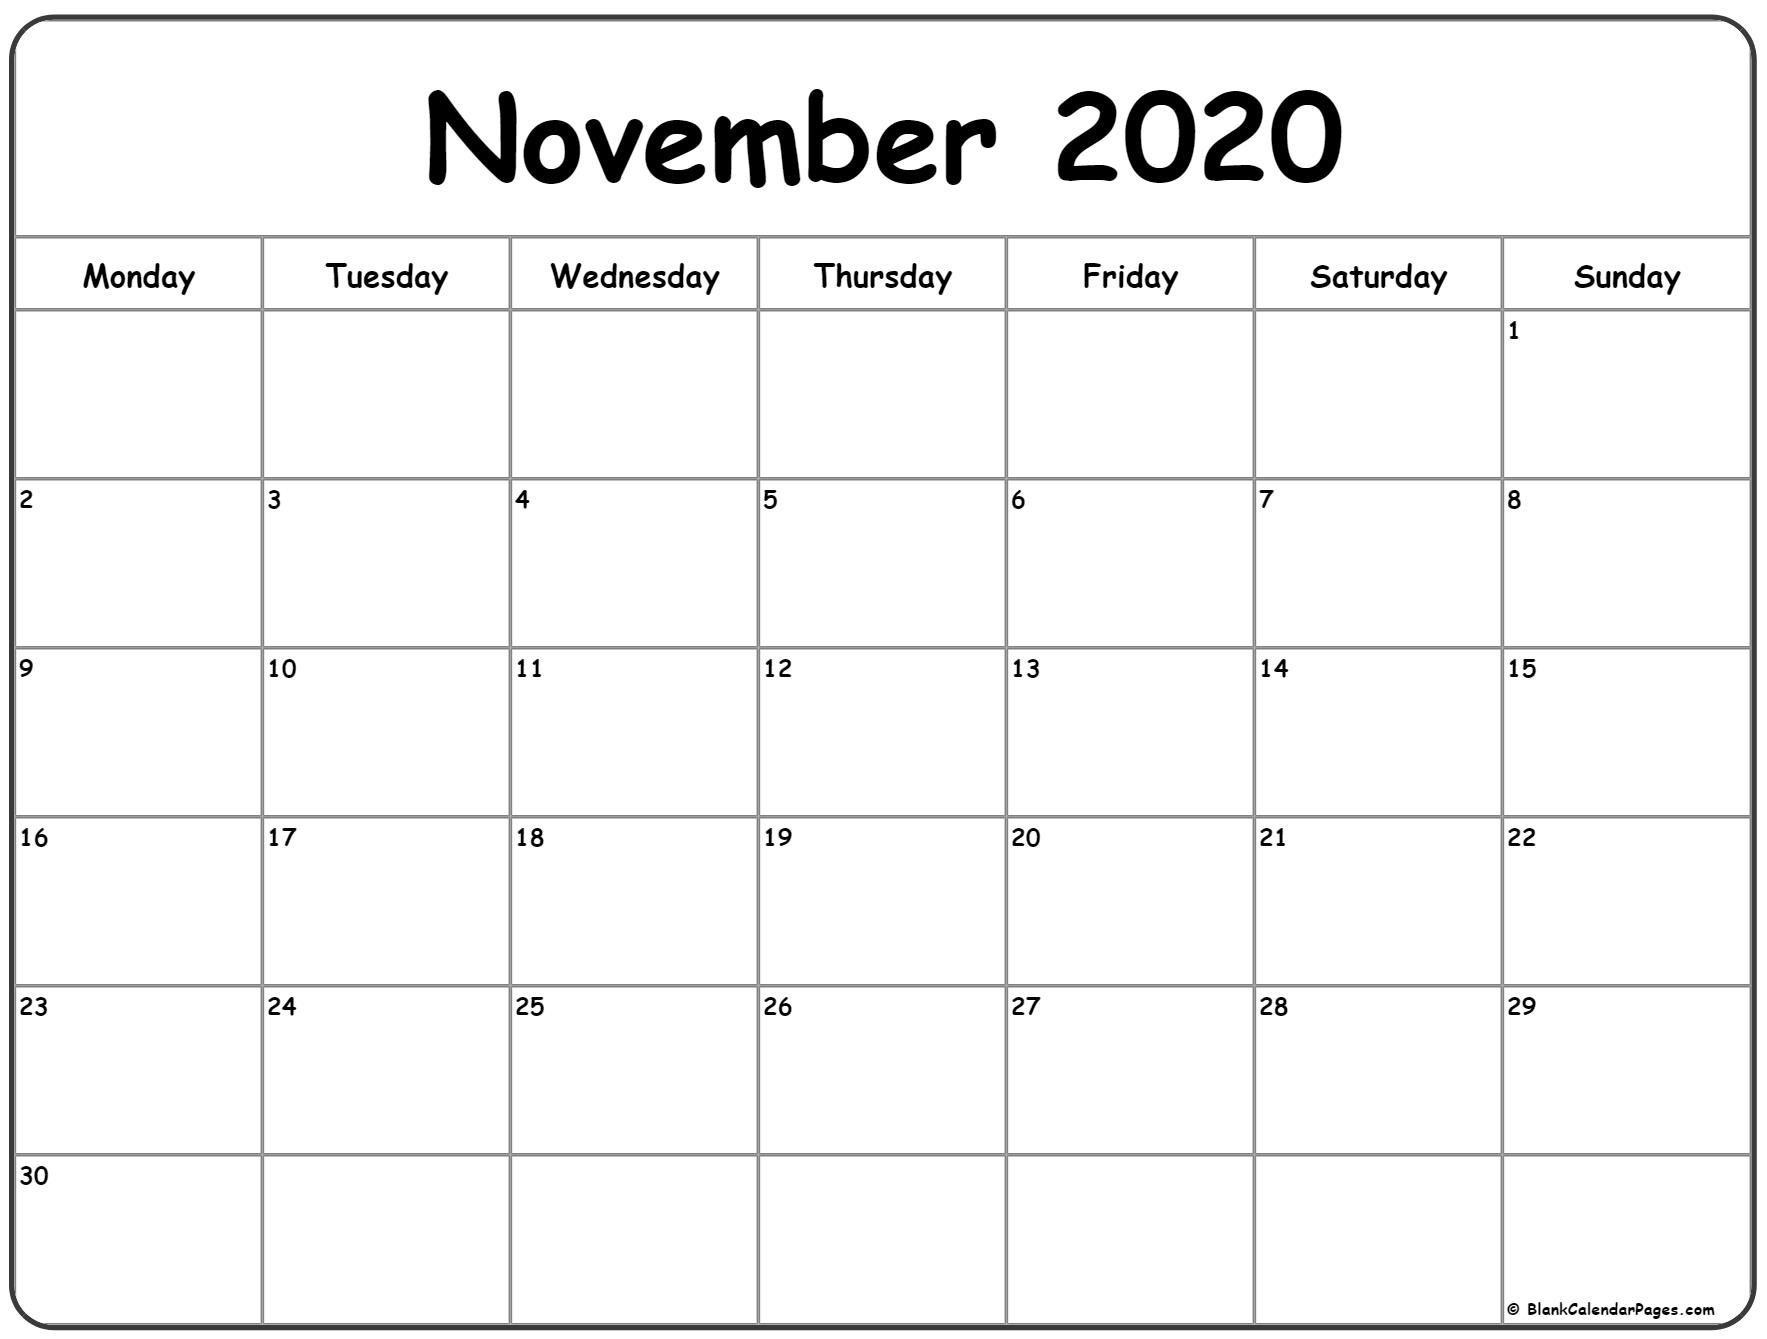 November 2020 Monday Calendar   Monday To Sunday In 2020